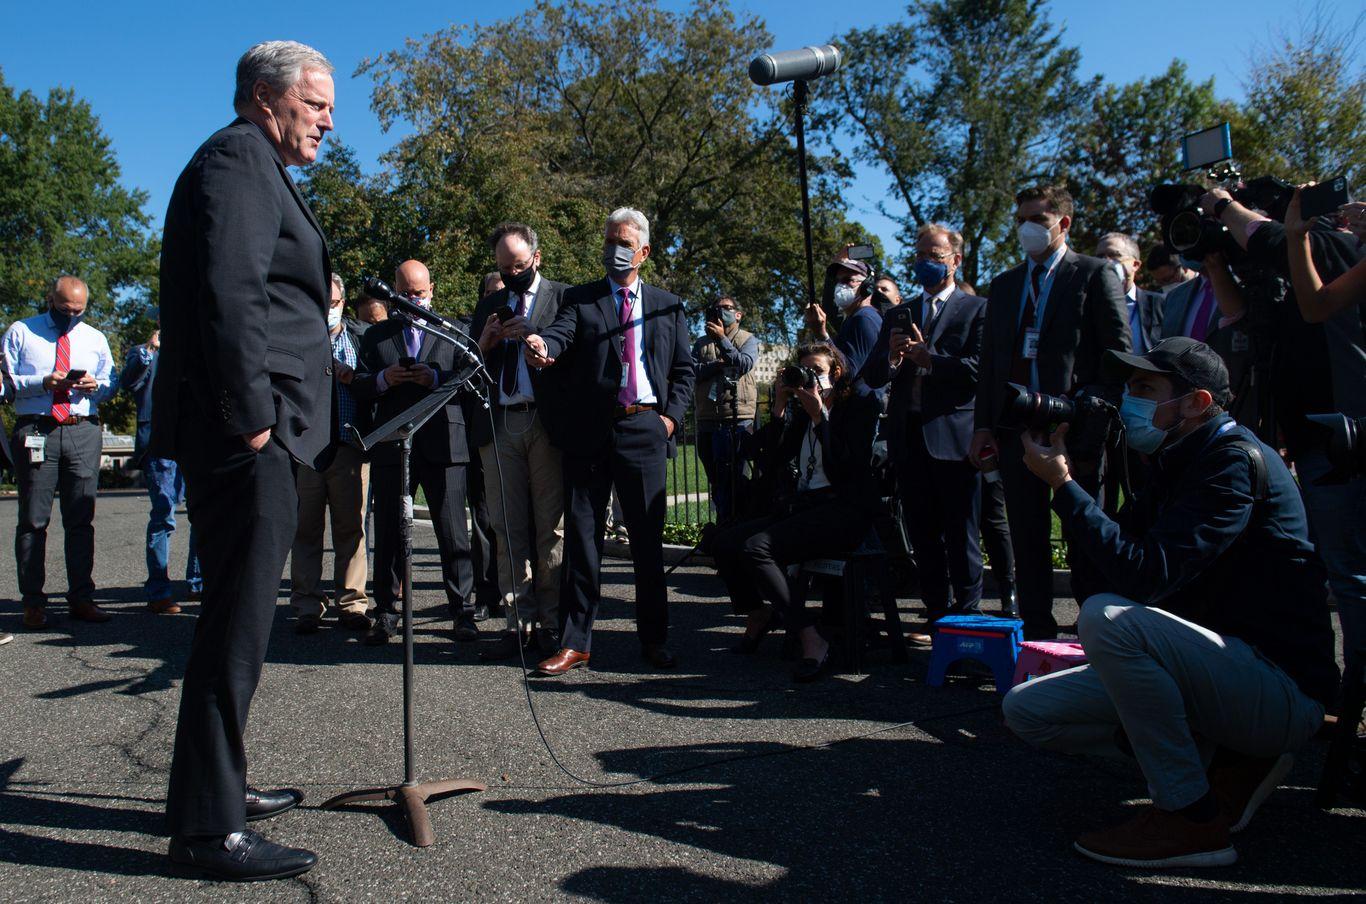 White House has no plans to mandate masks thumbnail